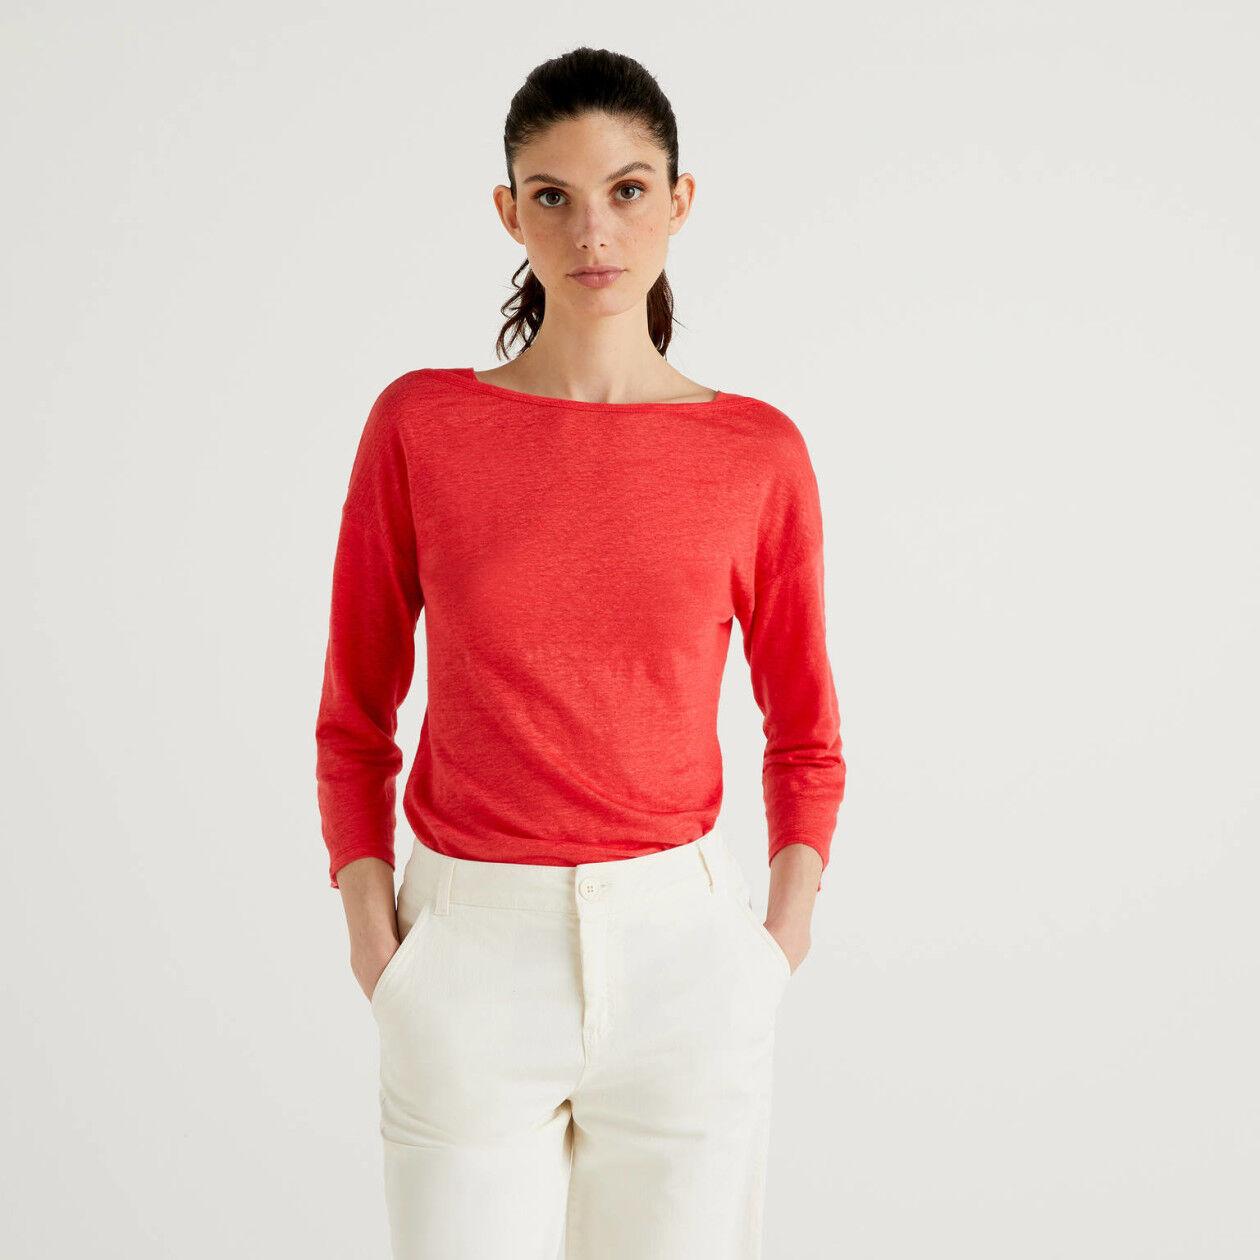 T-shirt από 100% λινό με μανίκια 3/4